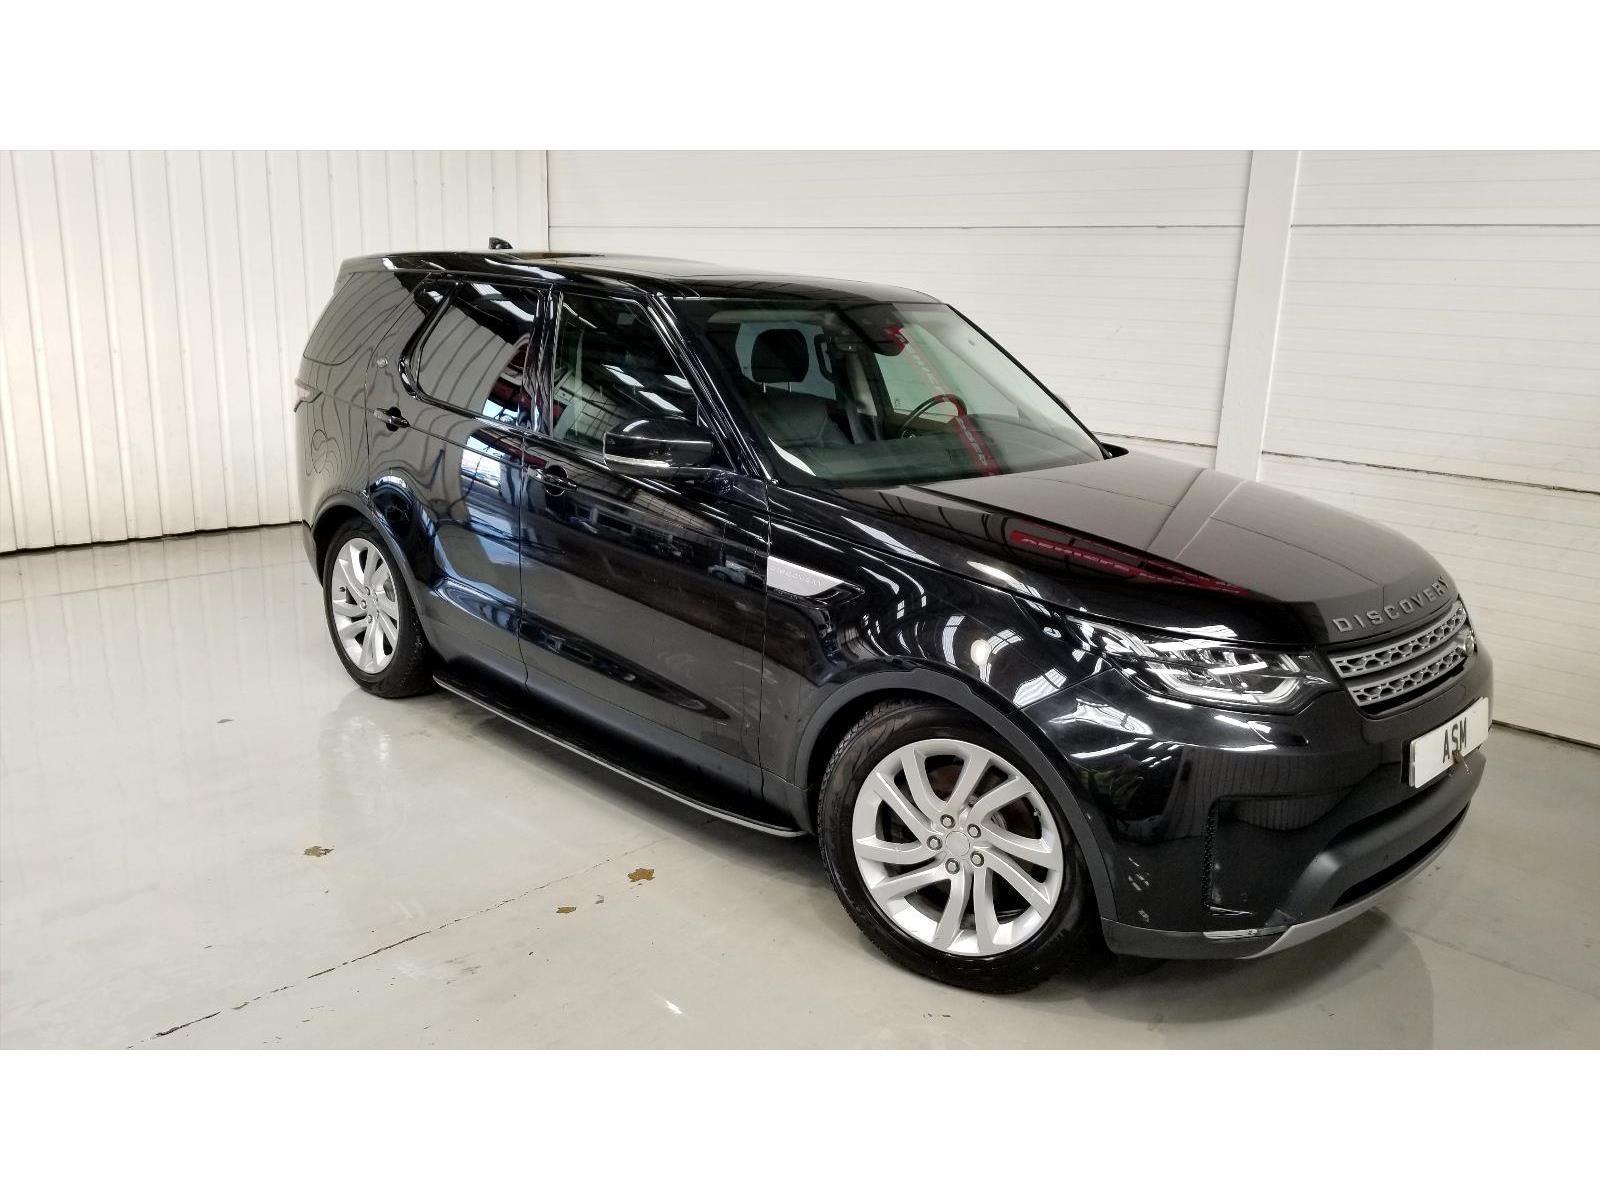 2018 Land Rover Discovery LHD 3000cc Petrol Automatic MPV